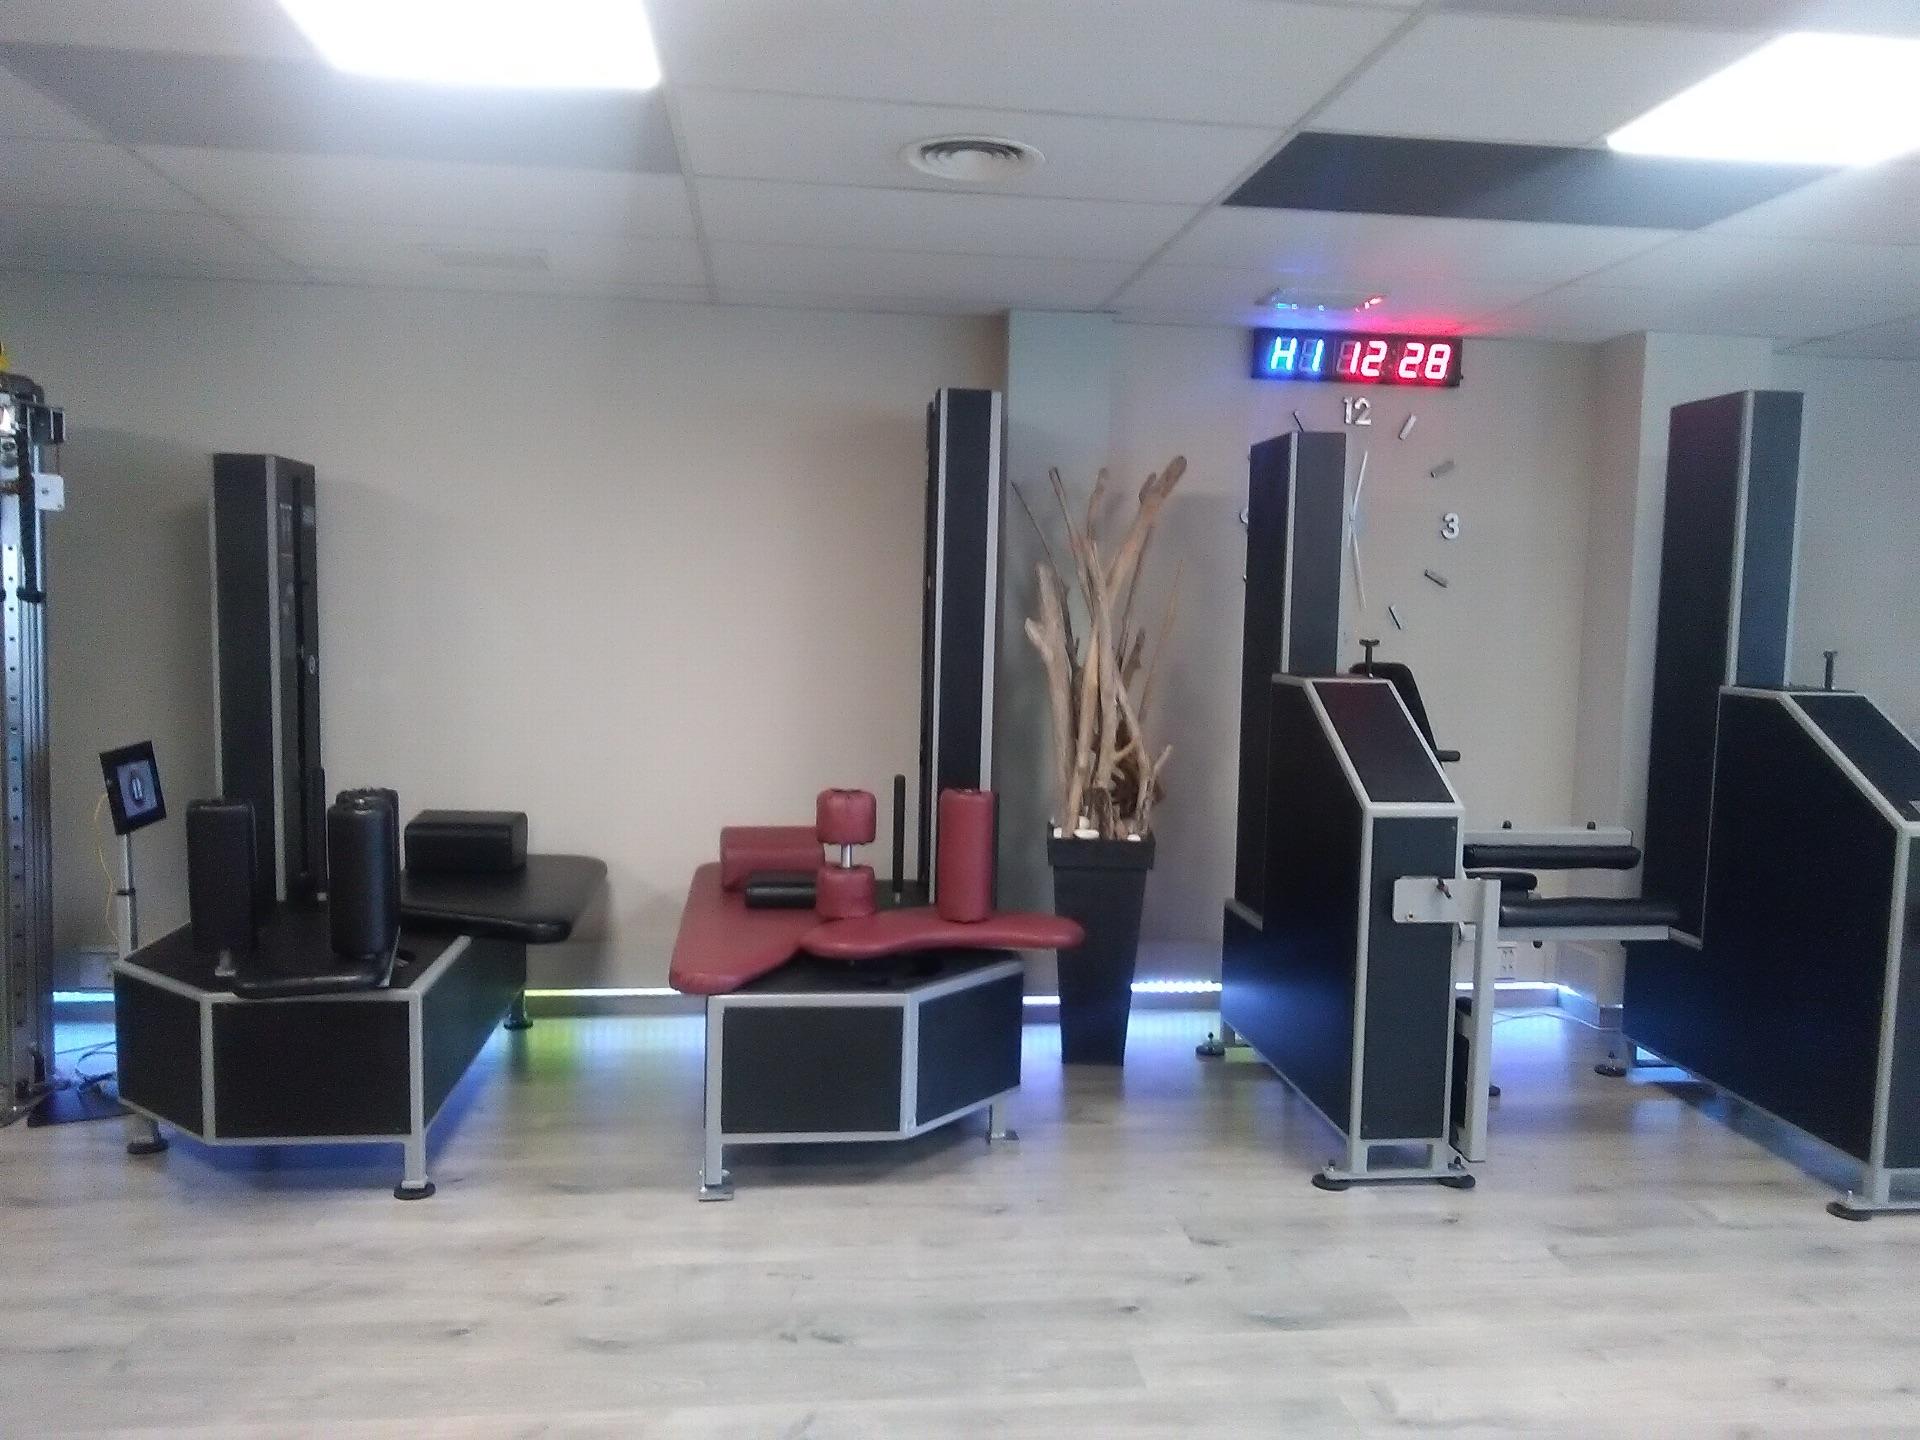 Protrainingcenter